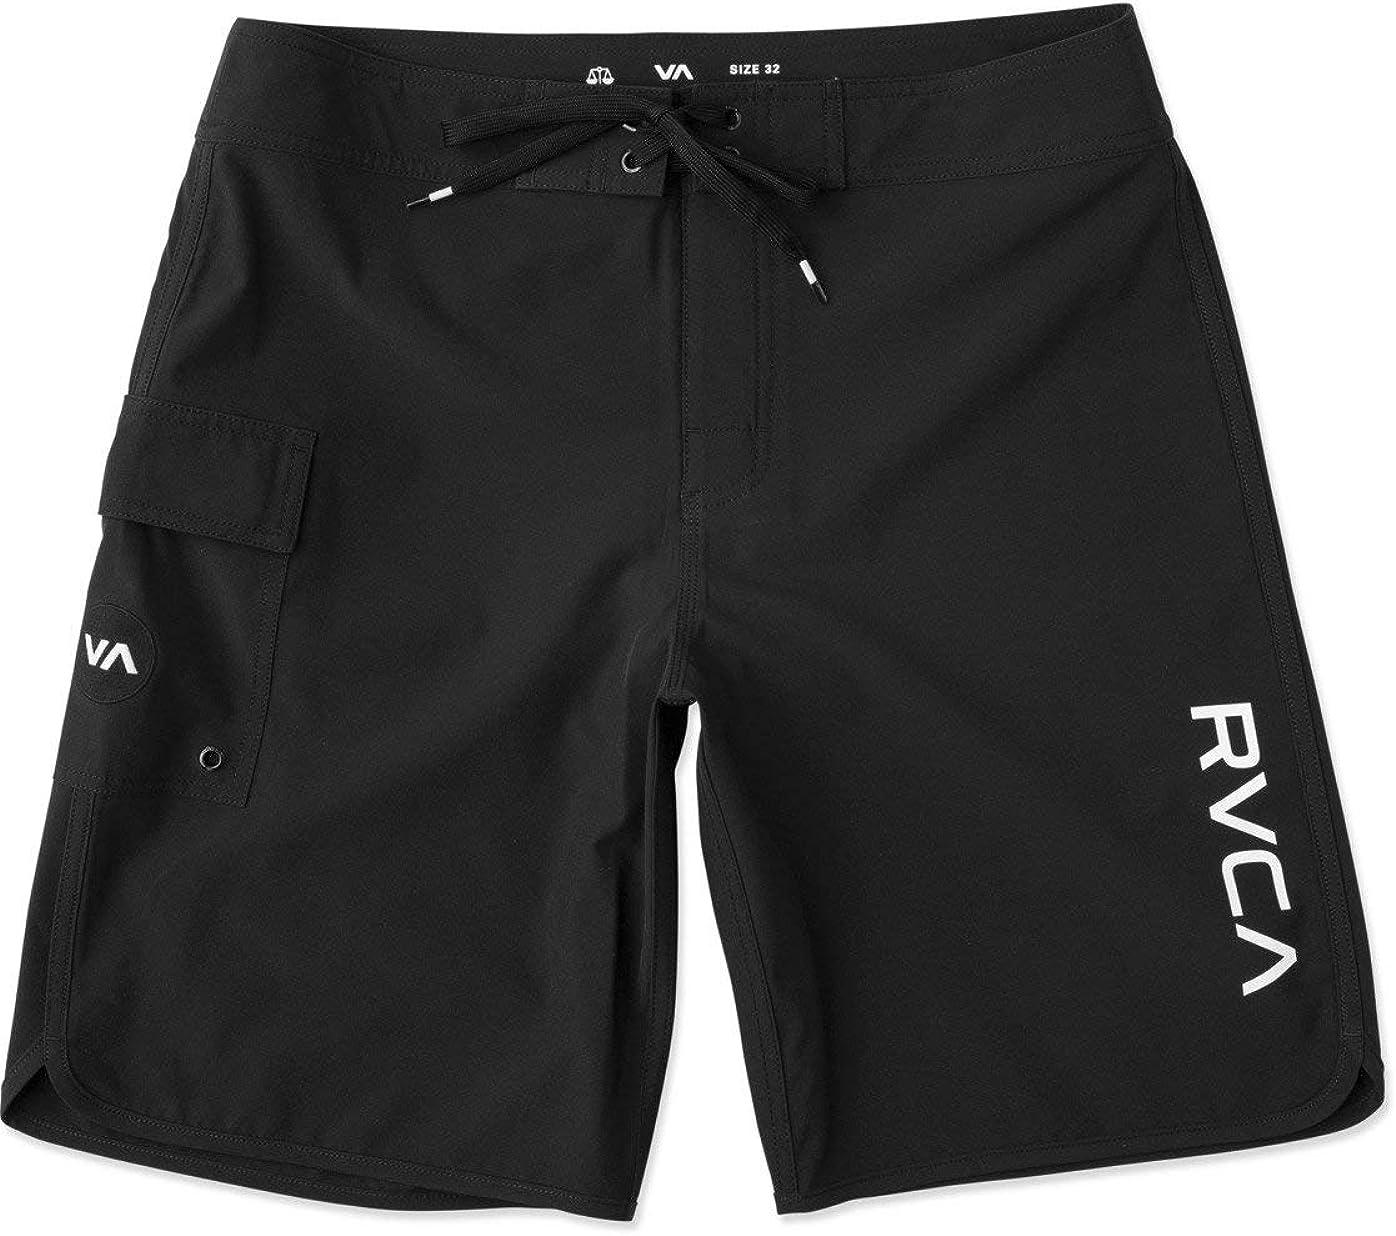 RVCA Men's 4 Way Stretch 18